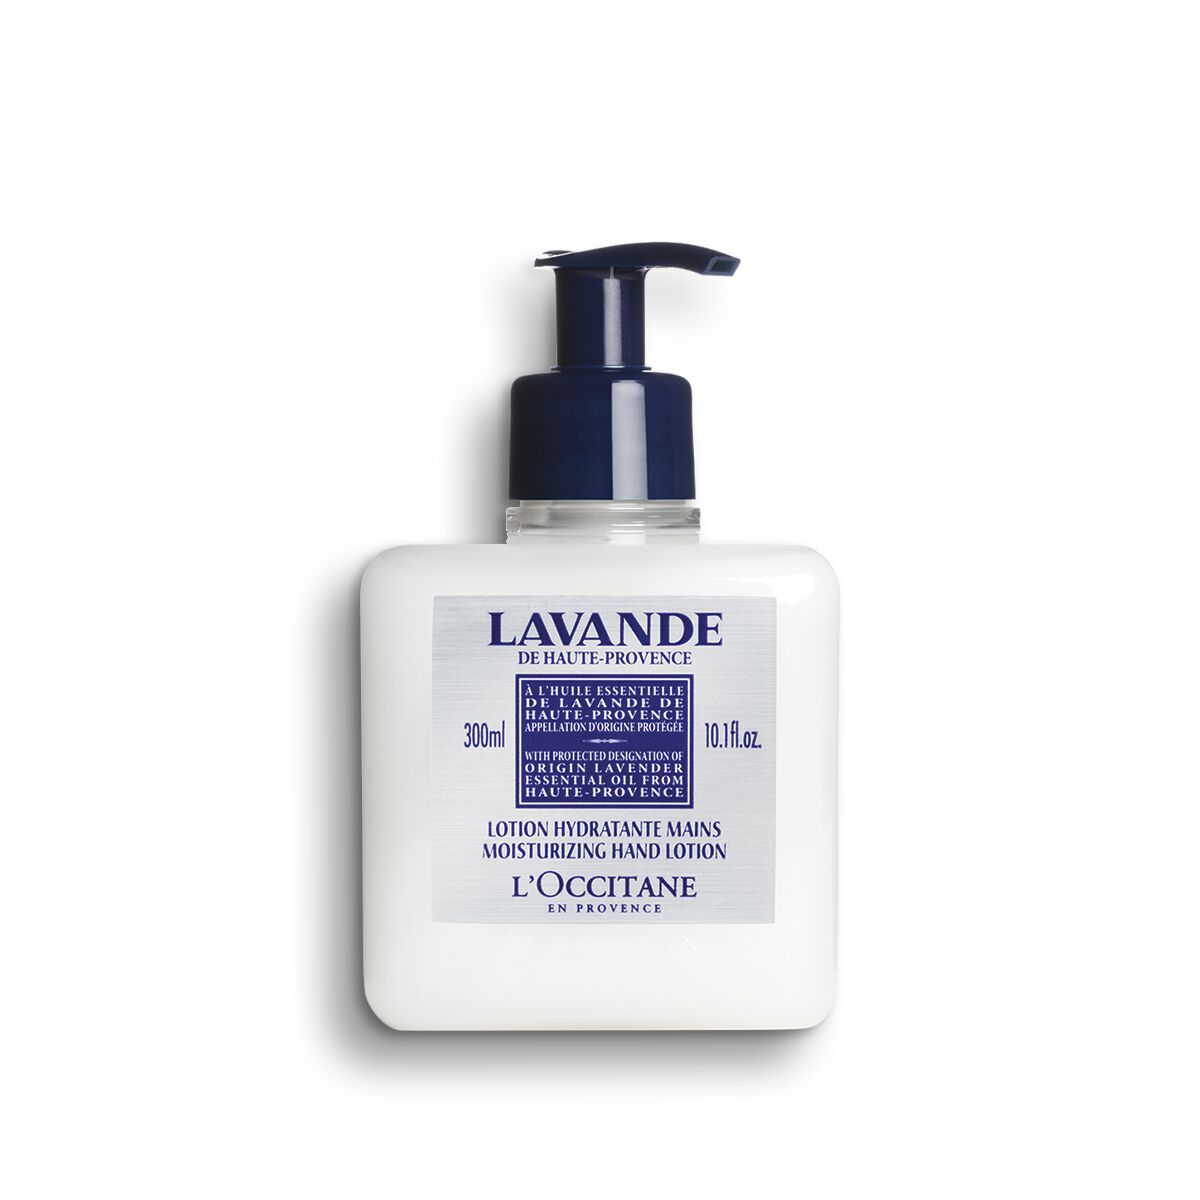 Lavender Moisturizing Hand Lotion 10.1 fl. oz.